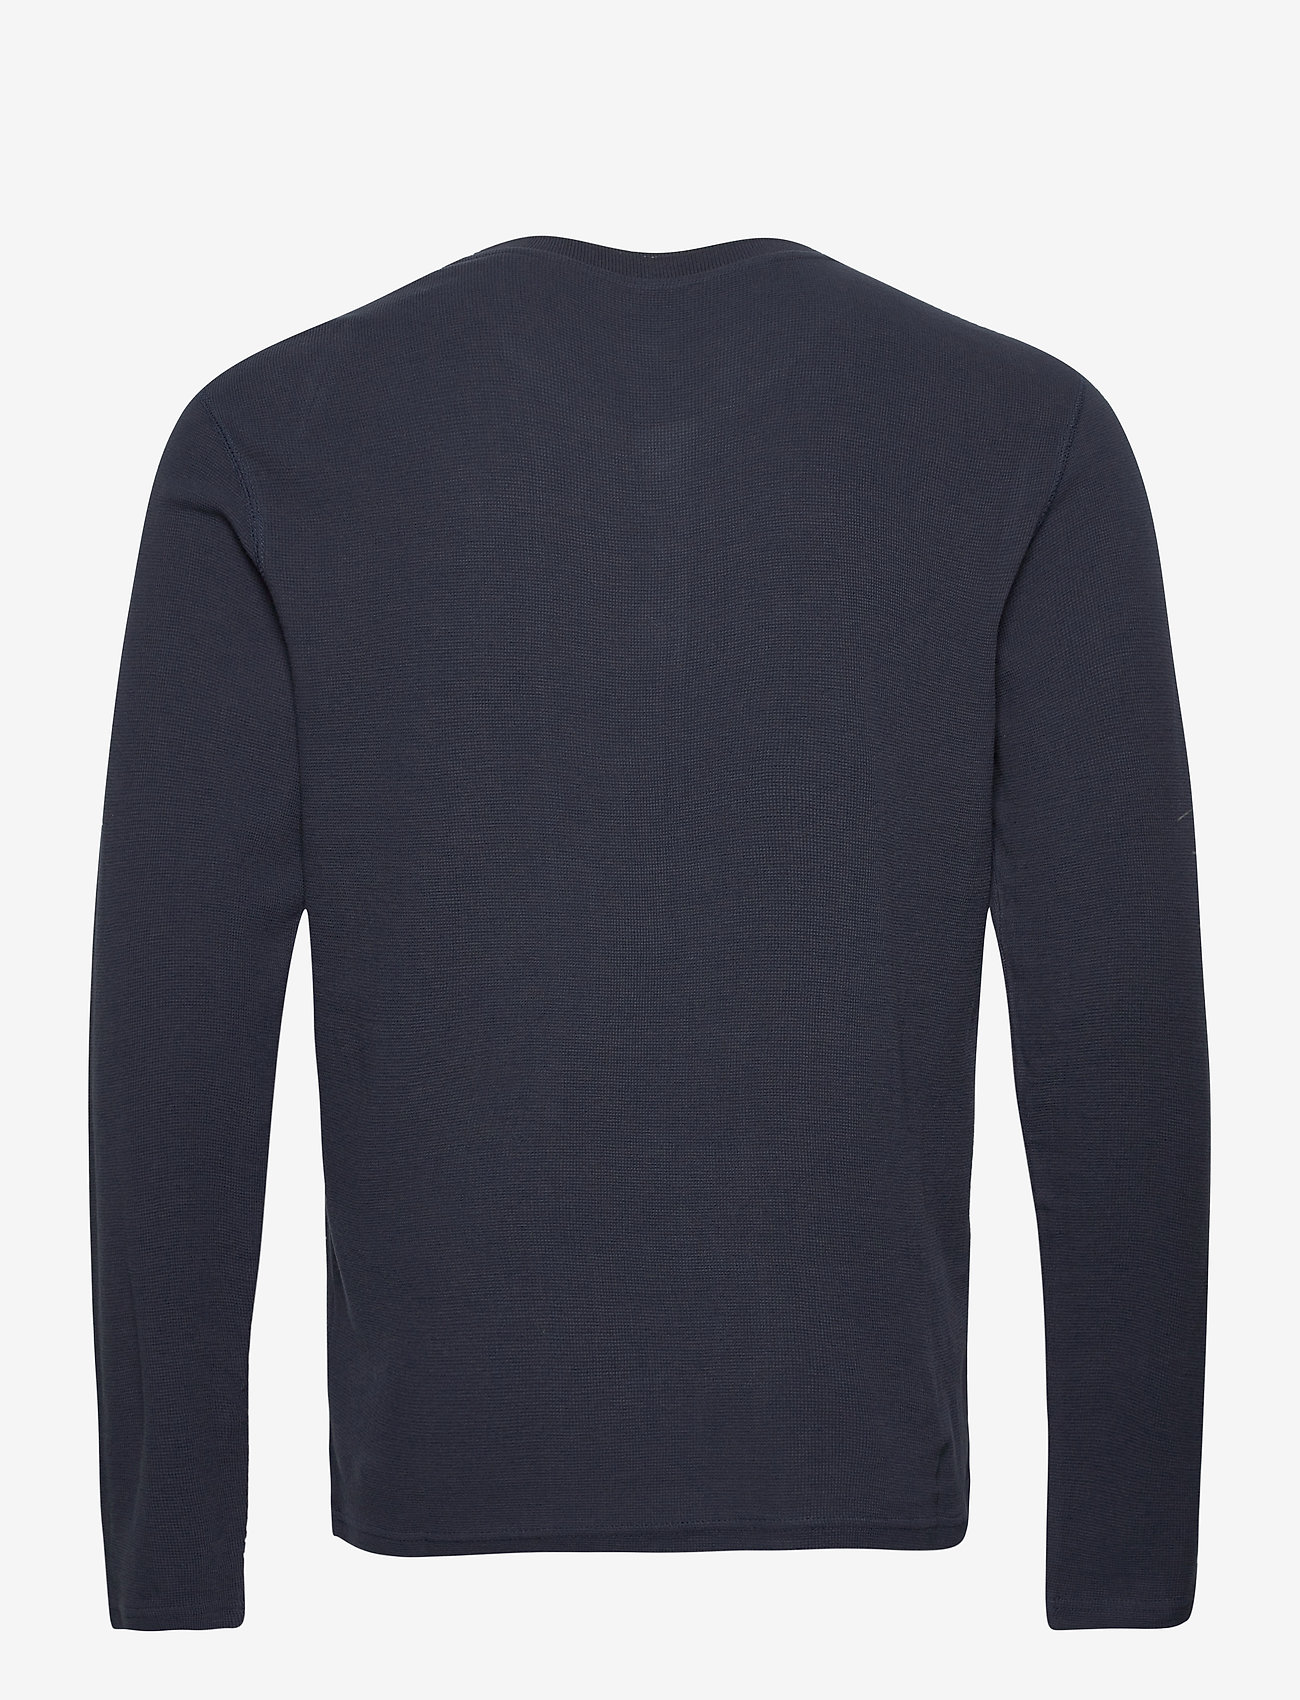 Marc O'Polo T-SHIRTS LONG SLEEVE - T-skjorter TOTAL ECLIPSE - Menn Klær